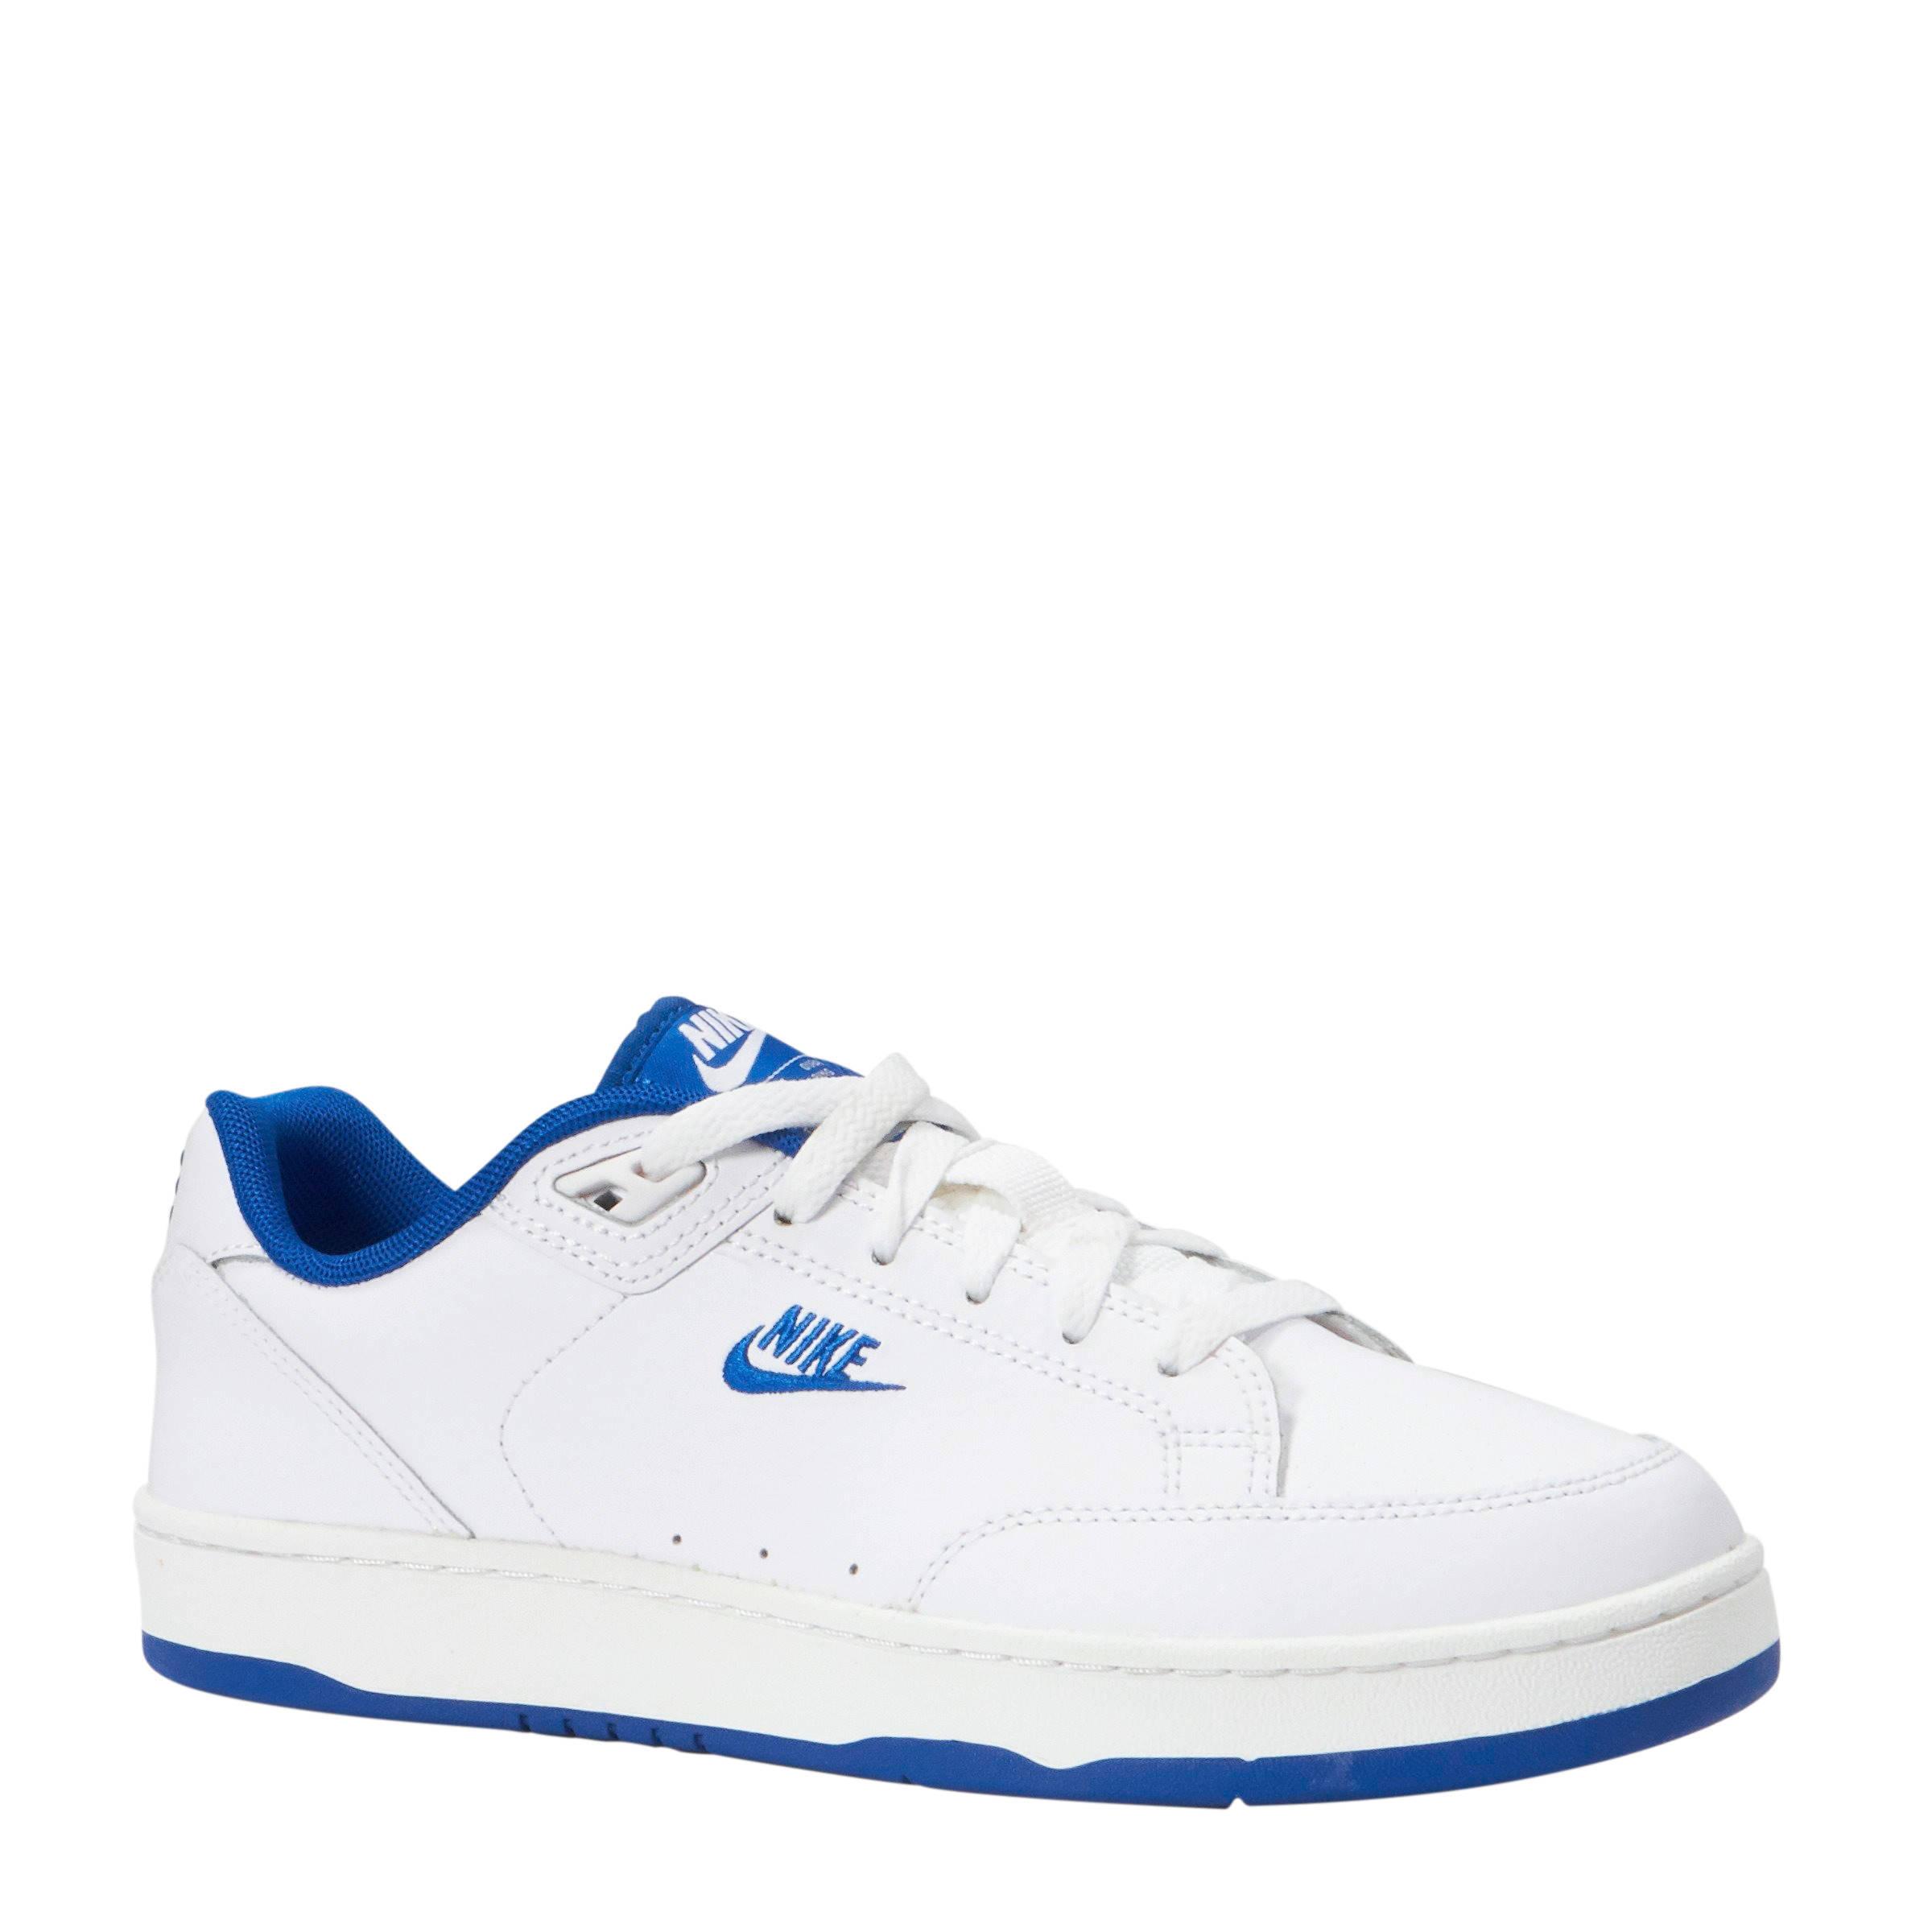 b997dd26656 nike-grandstand-ii-leren-sneakers-wit-blauw-wit-0882801987007.jpg